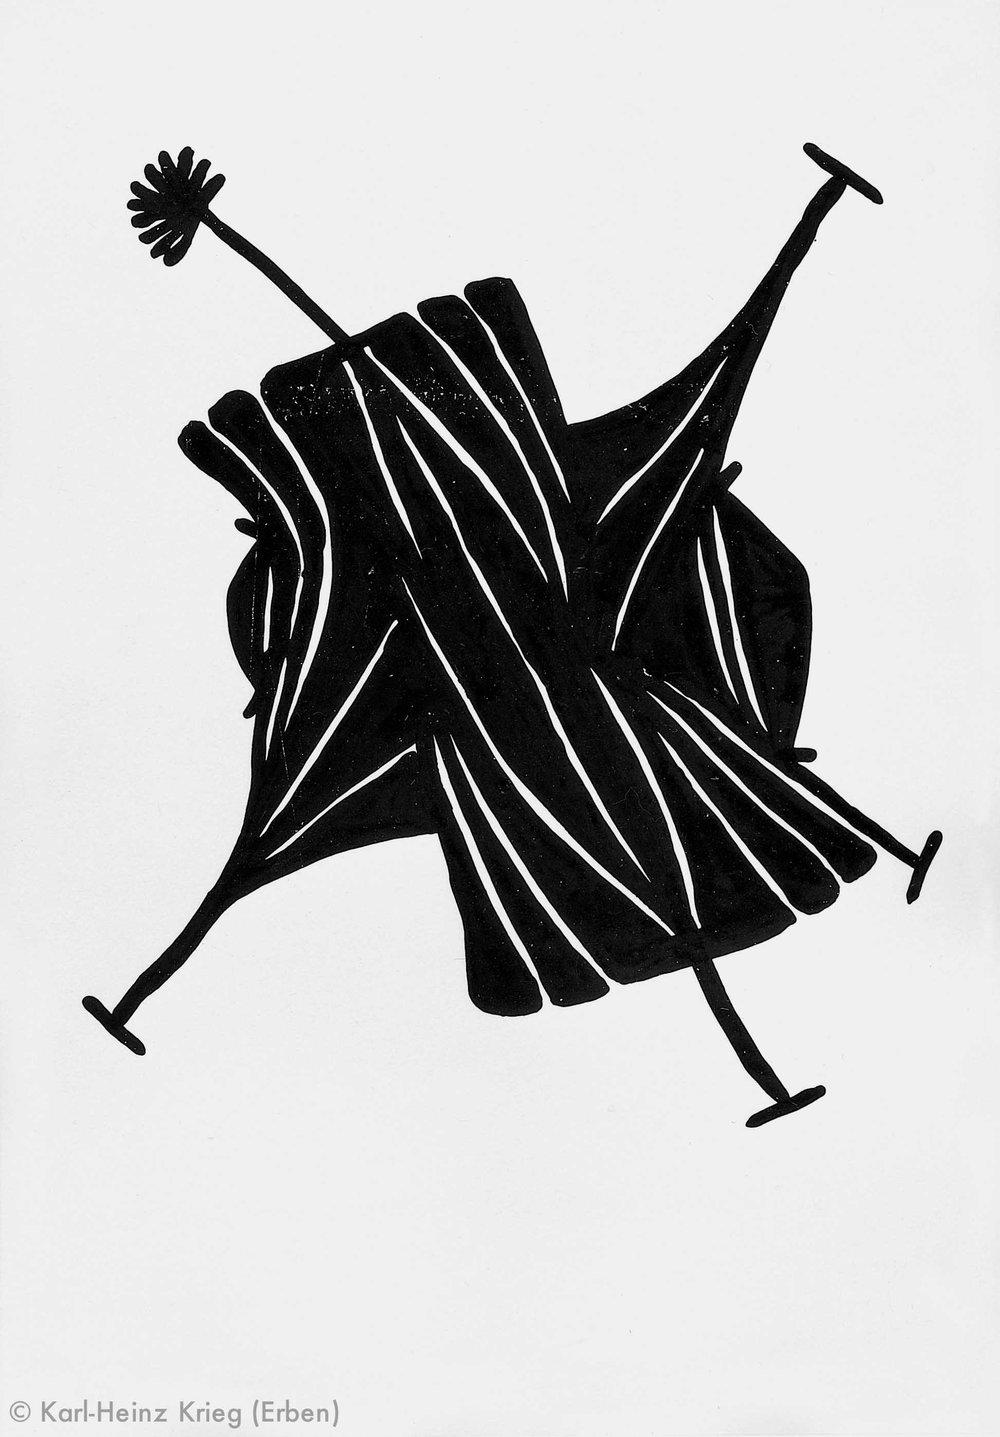 Gaou Béavogi Zawagi, 1991 Dispersionsfarbe/Papier 47,5 x 33,5 cm Werknr. 6-1991/4